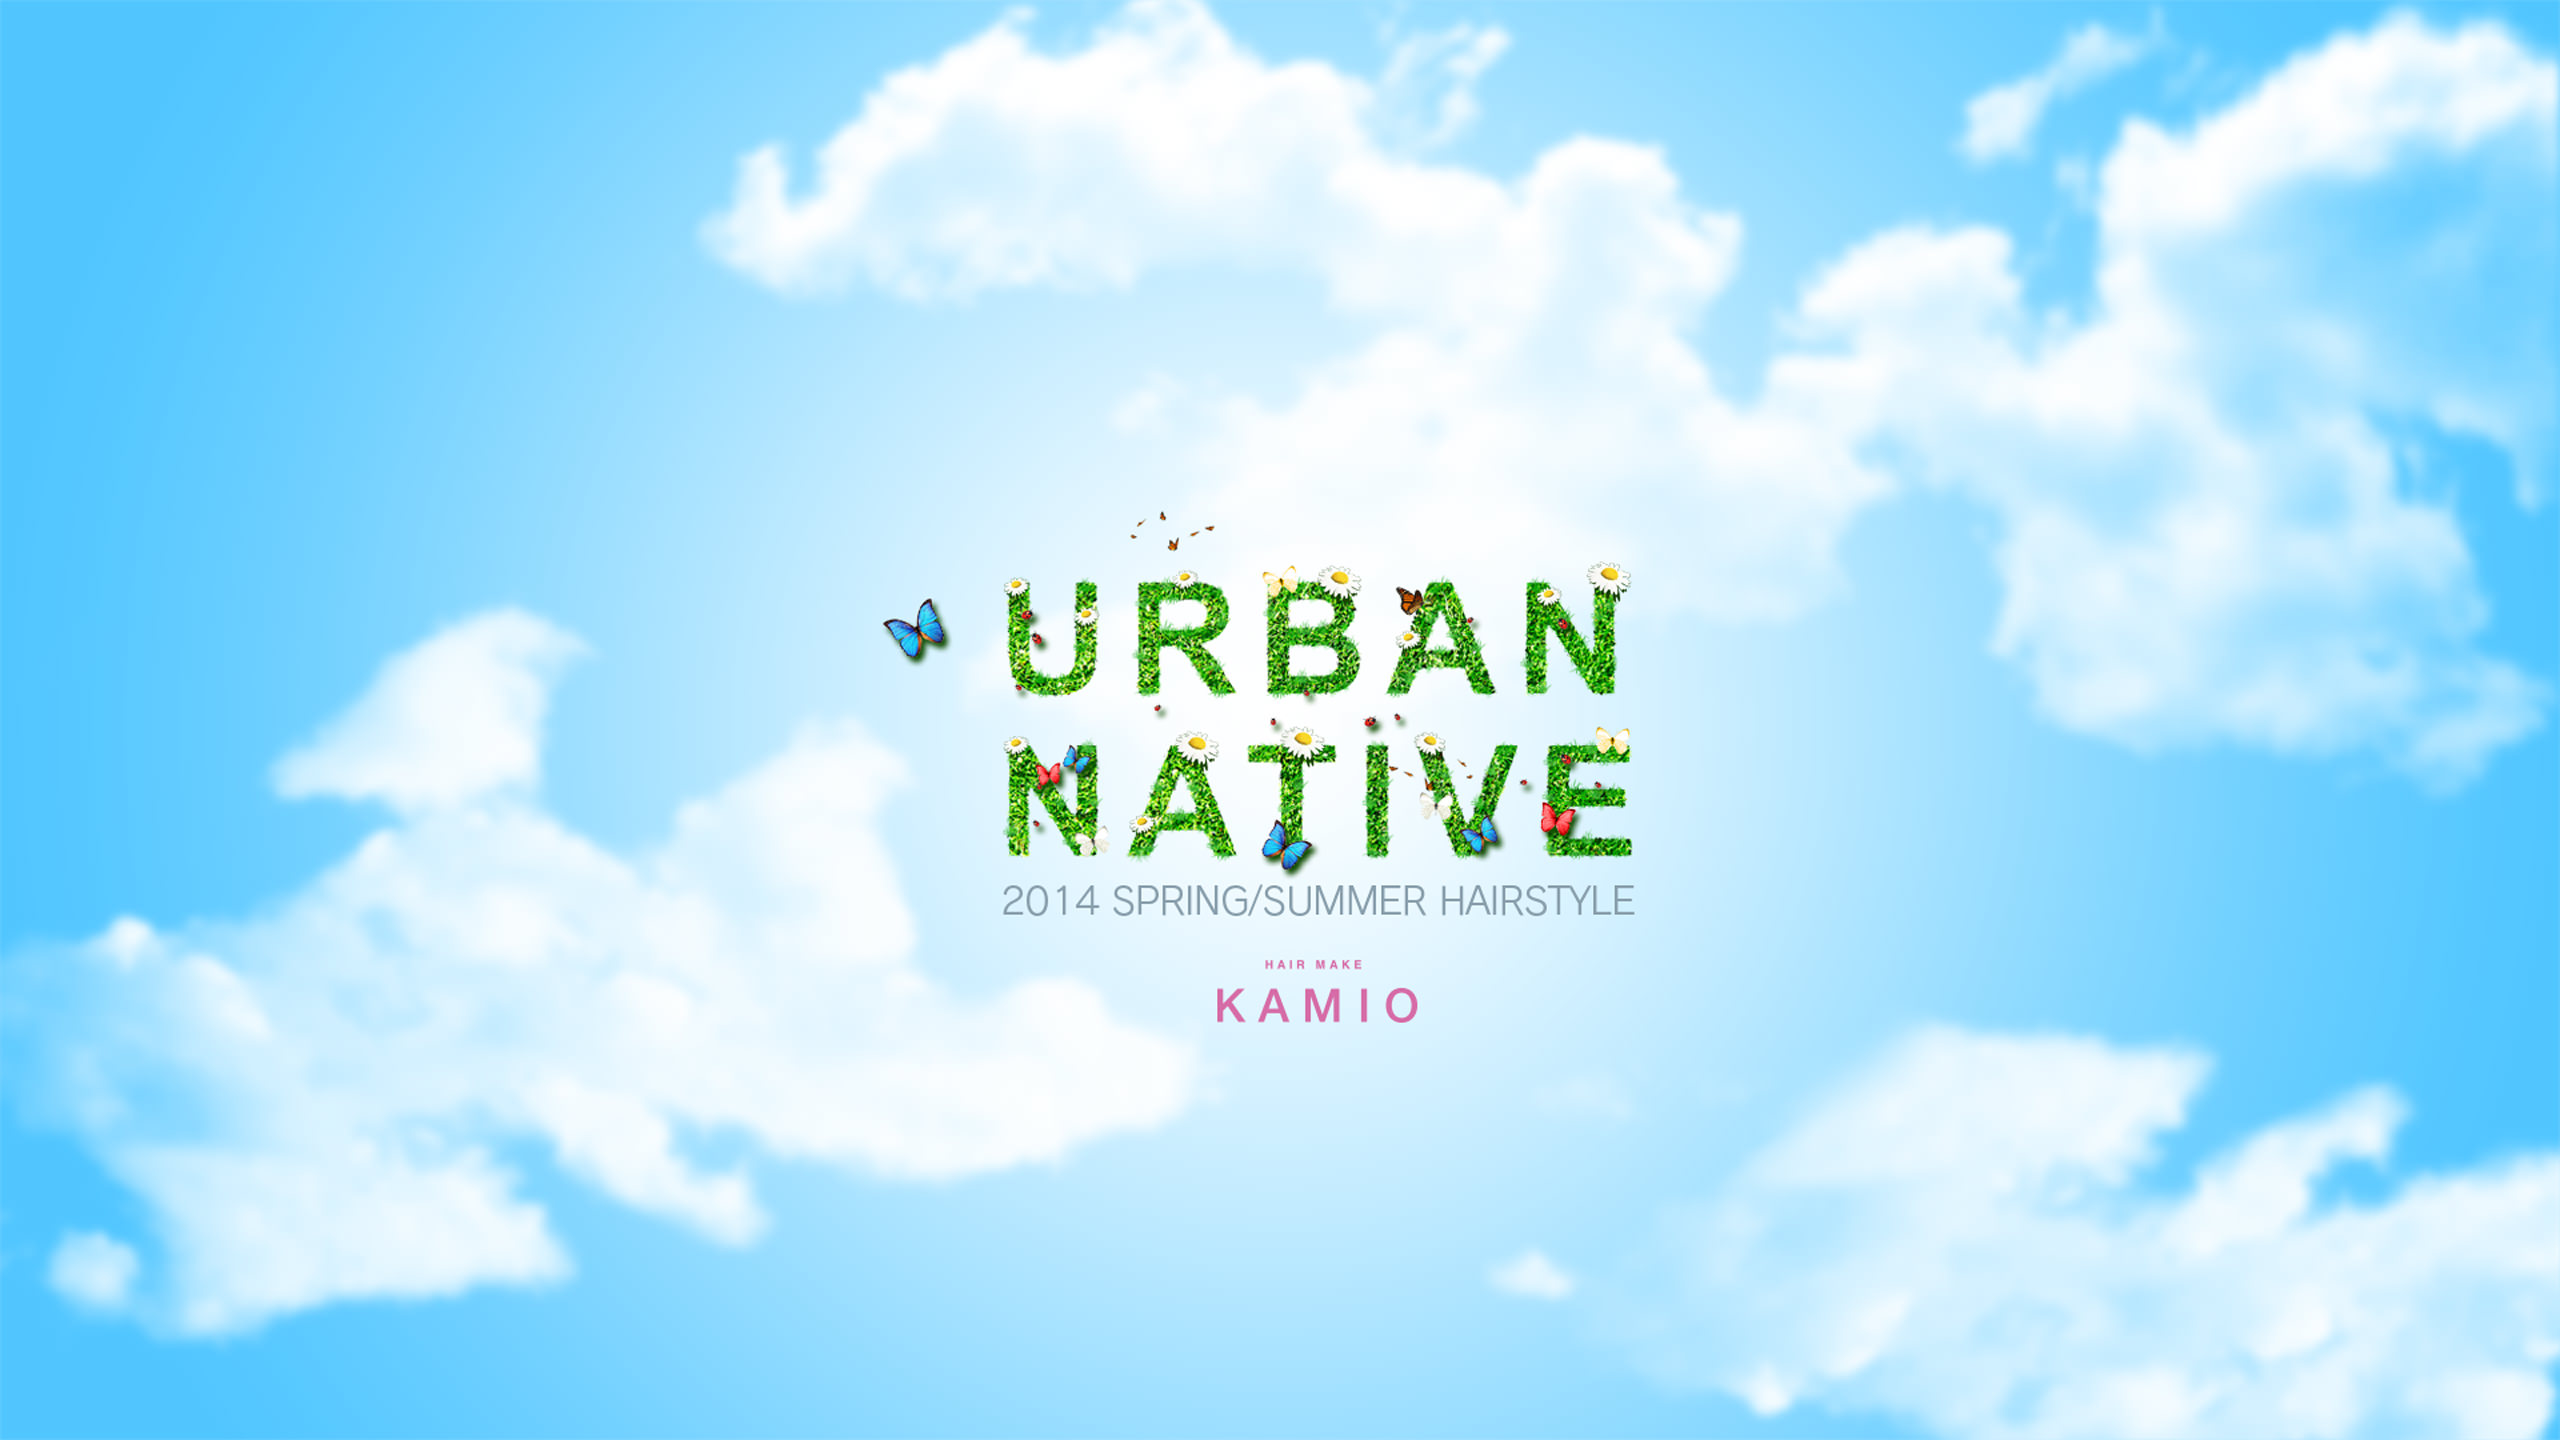 URBAN-NATIVE アーバンネイティブ カミオ2014